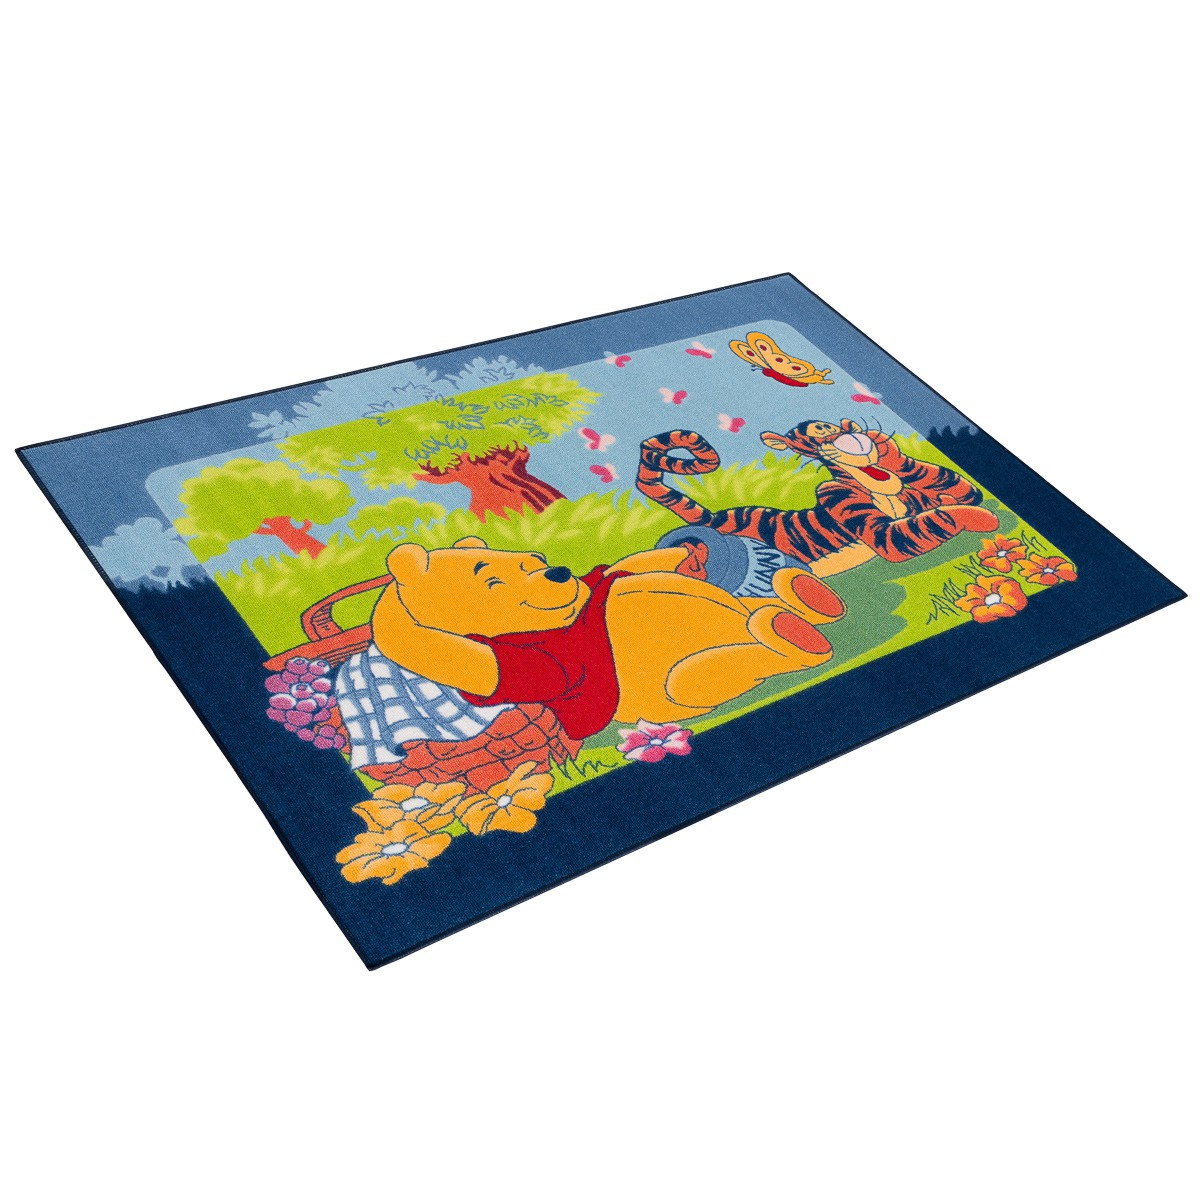 teppich winnie pooh picknick 95x133cm blau gr n. Black Bedroom Furniture Sets. Home Design Ideas